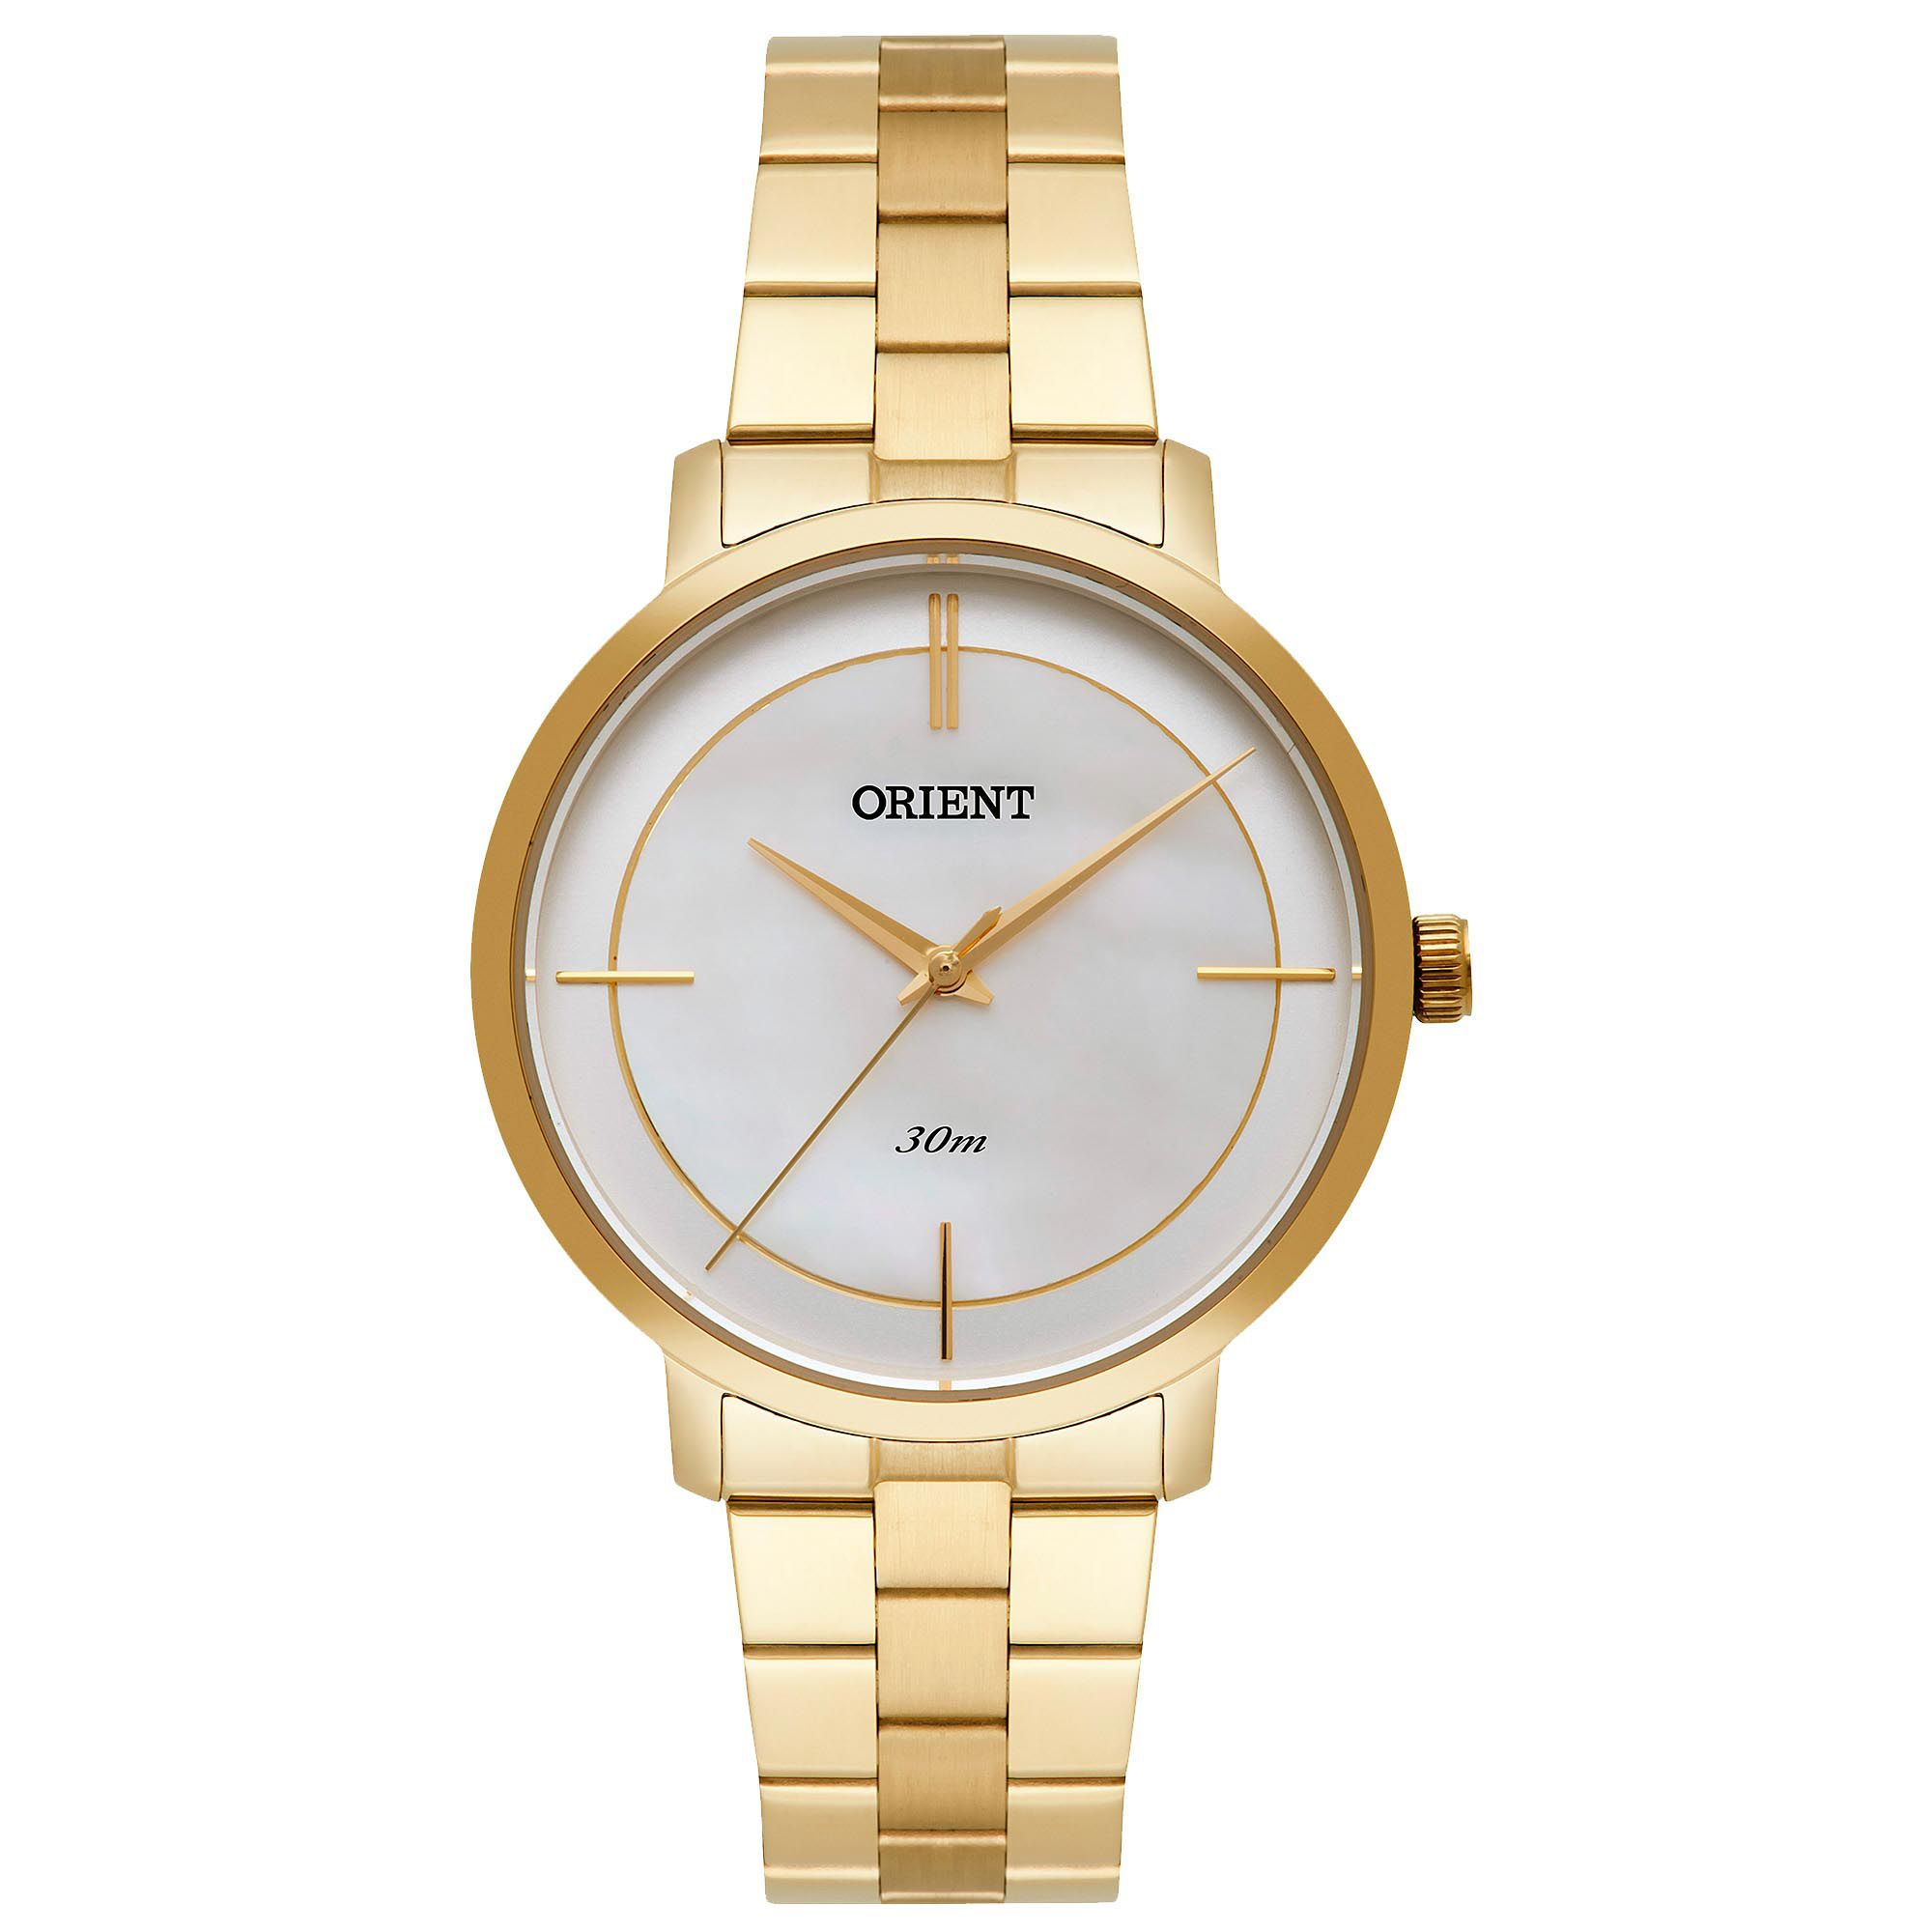 Relógio Feminino Orient FGSS0101 B1KX